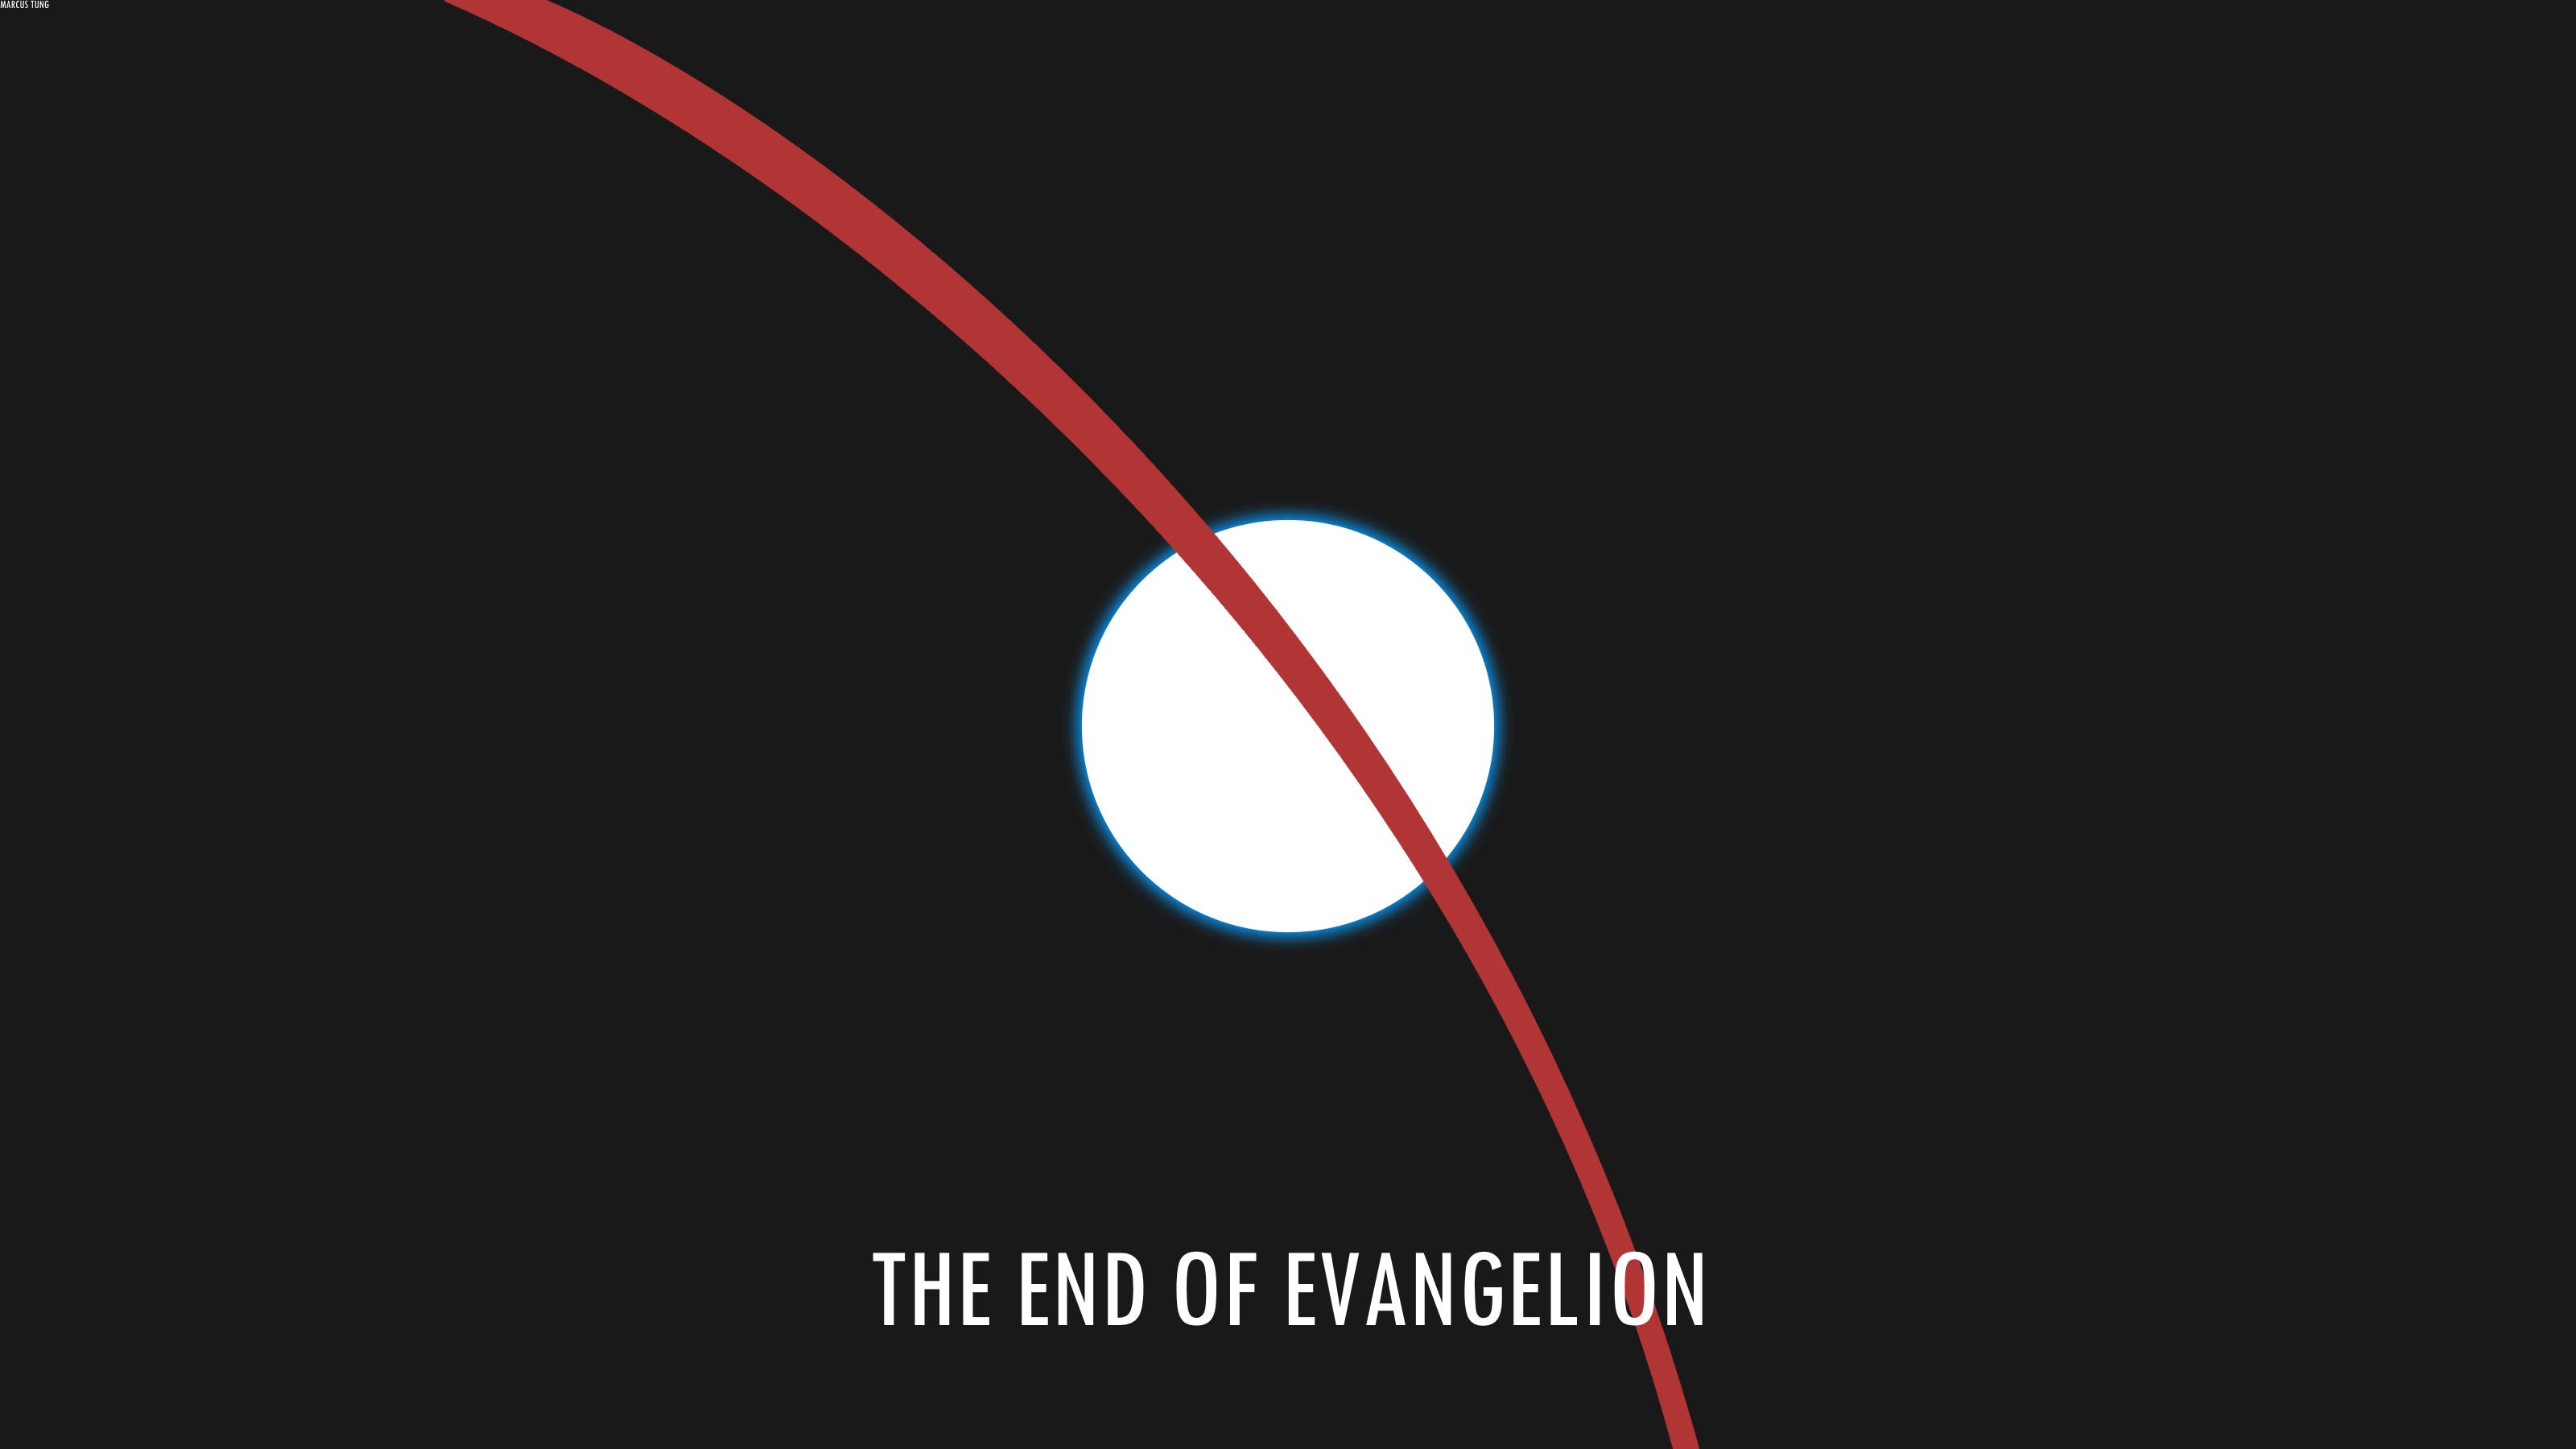 Wallpaper Neon Genesis Evangelion Logo Circle Brand